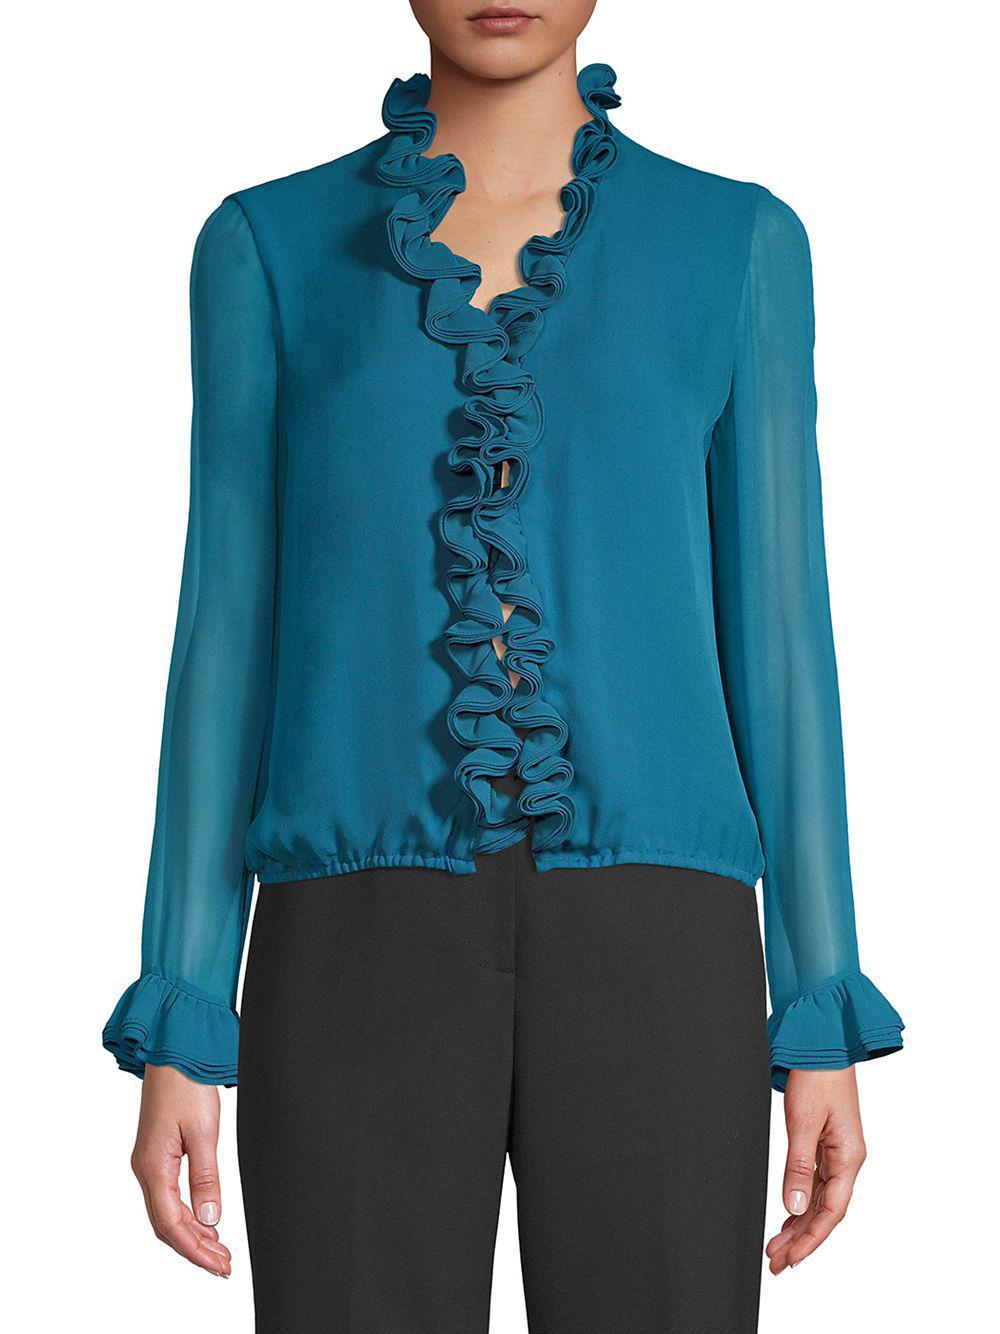 507934d9058db8 Elie Tahari Chandana Silk Blouse in Blue - Lyst